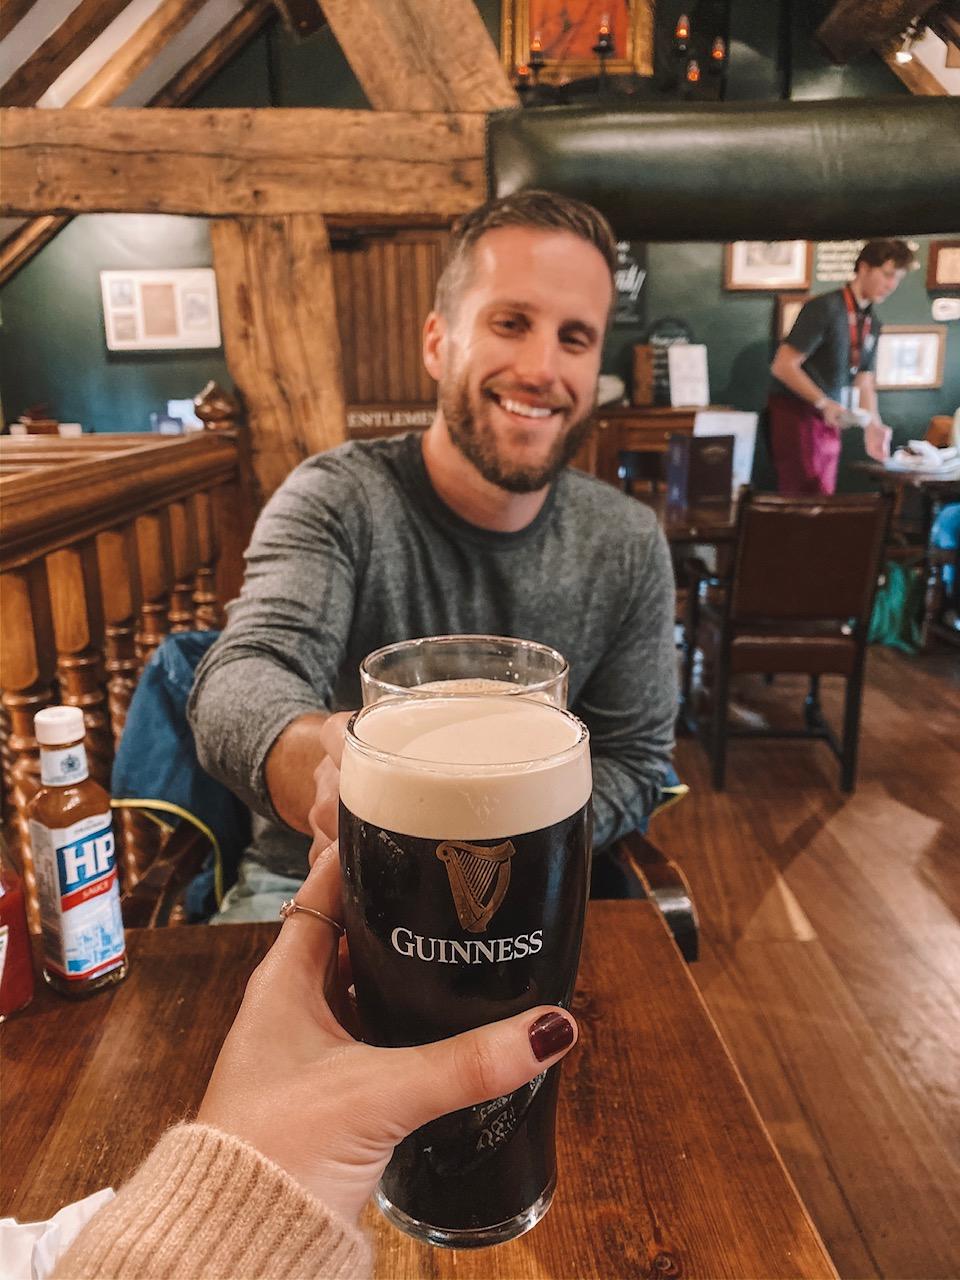 Travel blogger Amanda's OK drinks a beer at Manchester's oldest pub